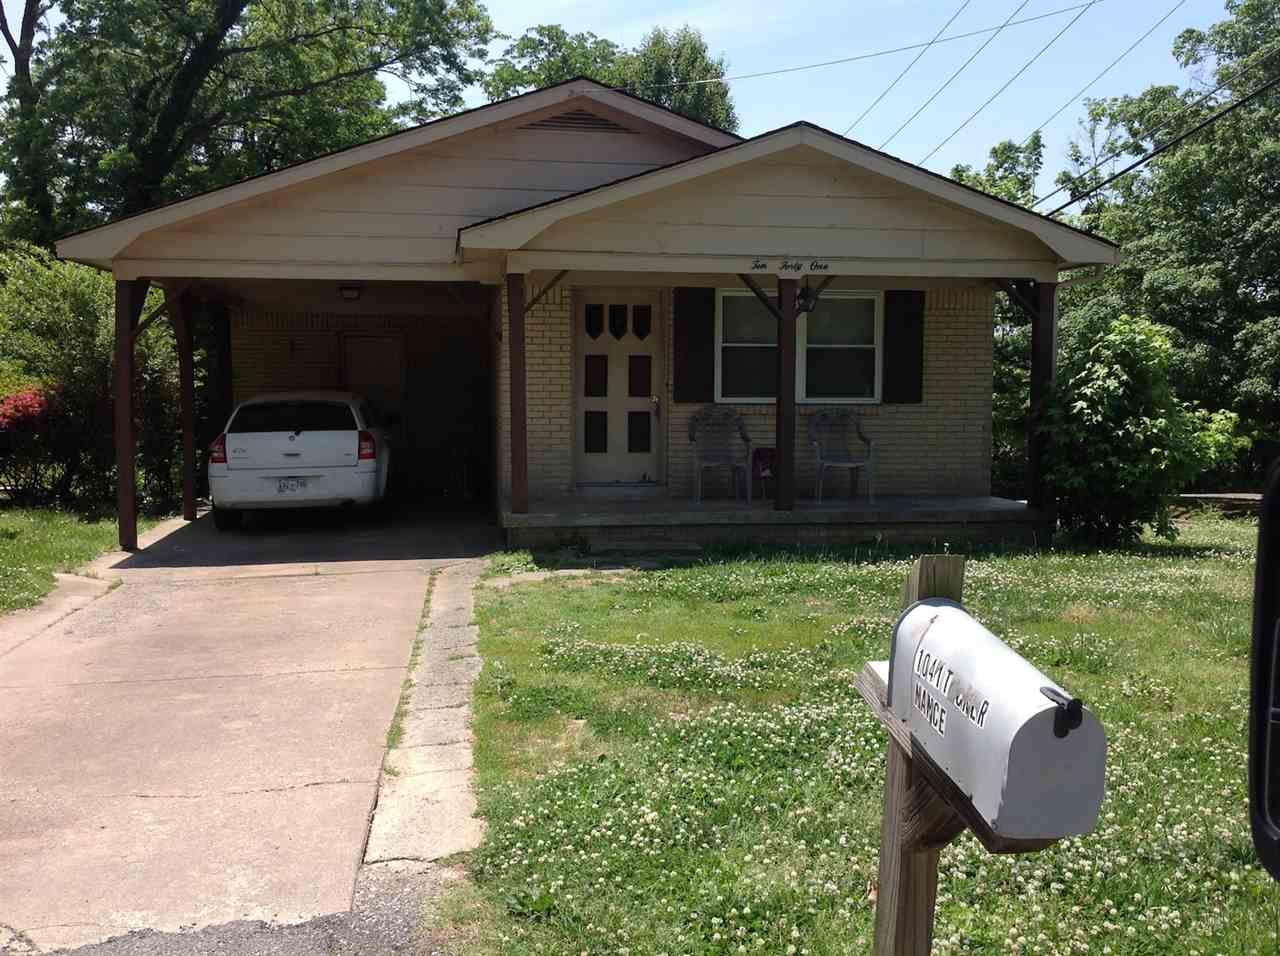 1041 Tucker Street,Dyersburg,Tennessee 38024,3 Bedrooms Bedrooms,1 BathroomBathrooms,Residential,1041 Tucker Street,182879